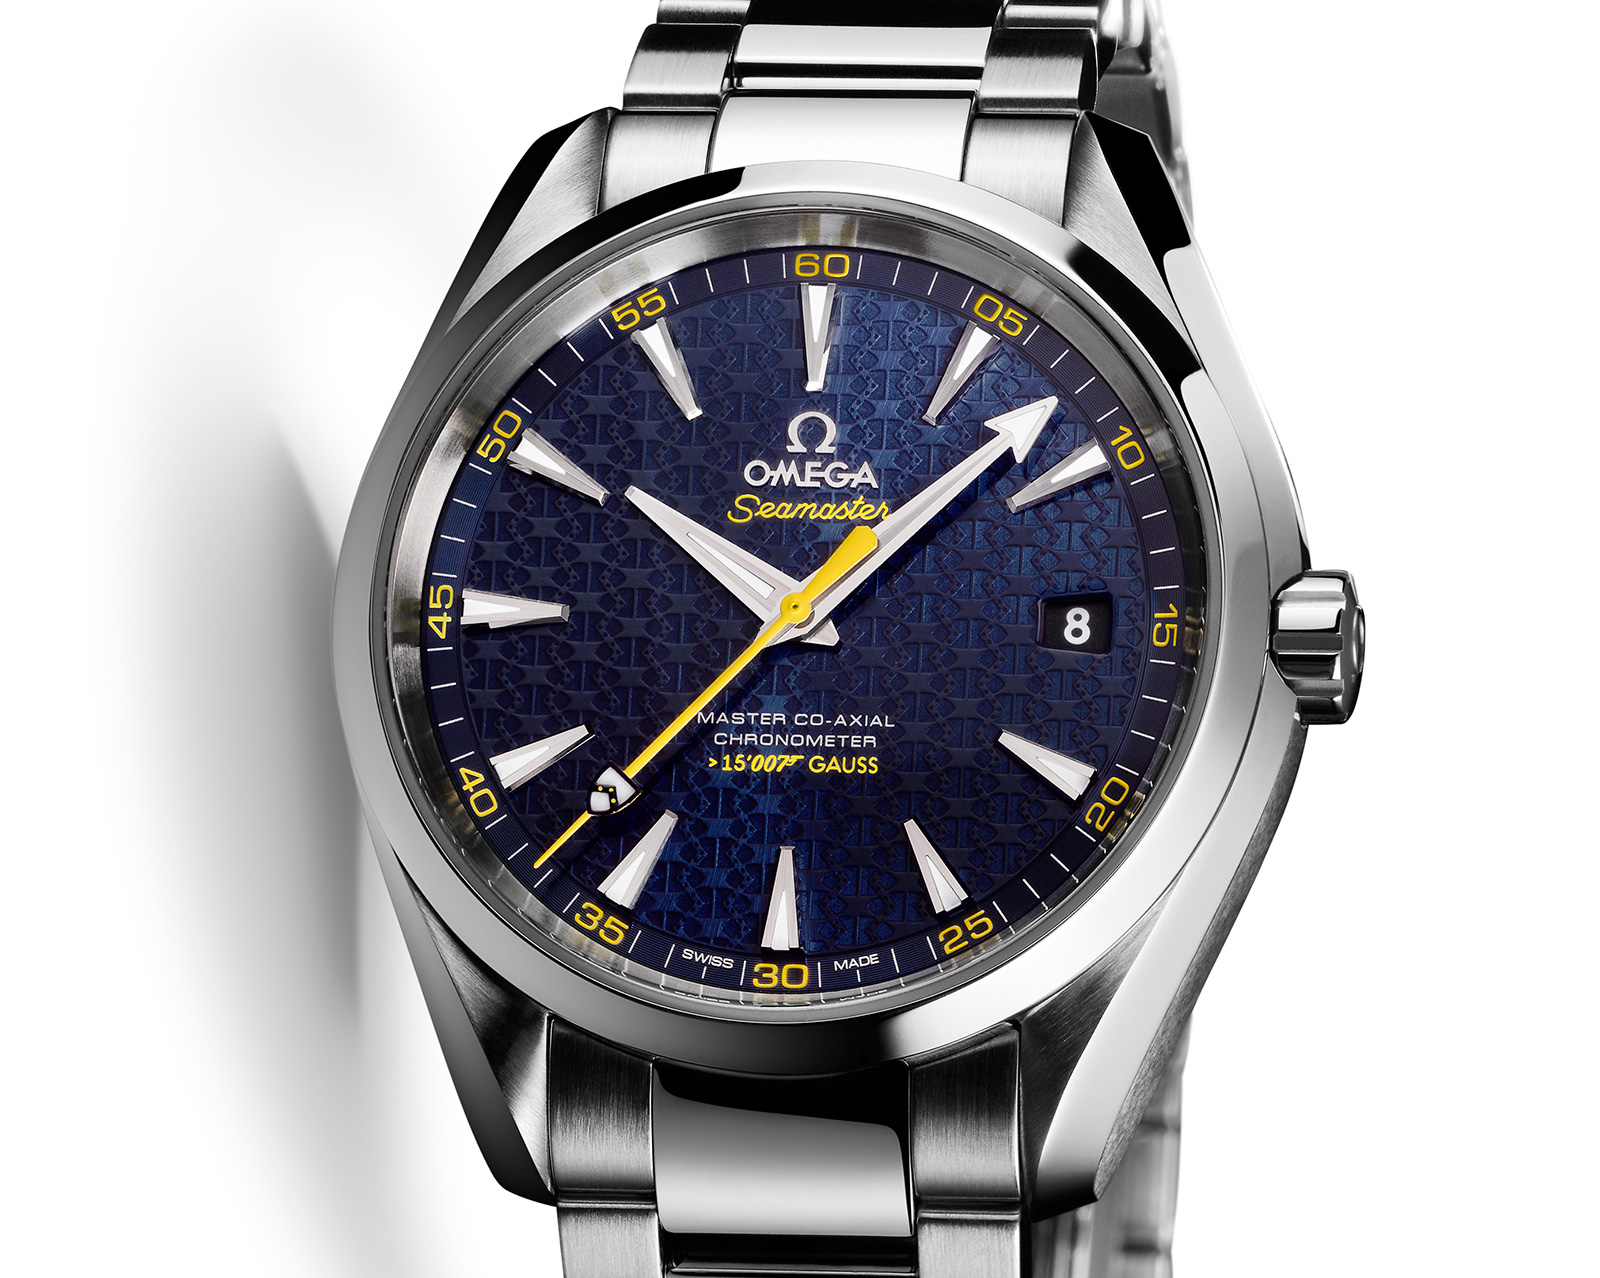 Omega-Seamaster-Aqua-Terra-James-Bond-Spectre-2